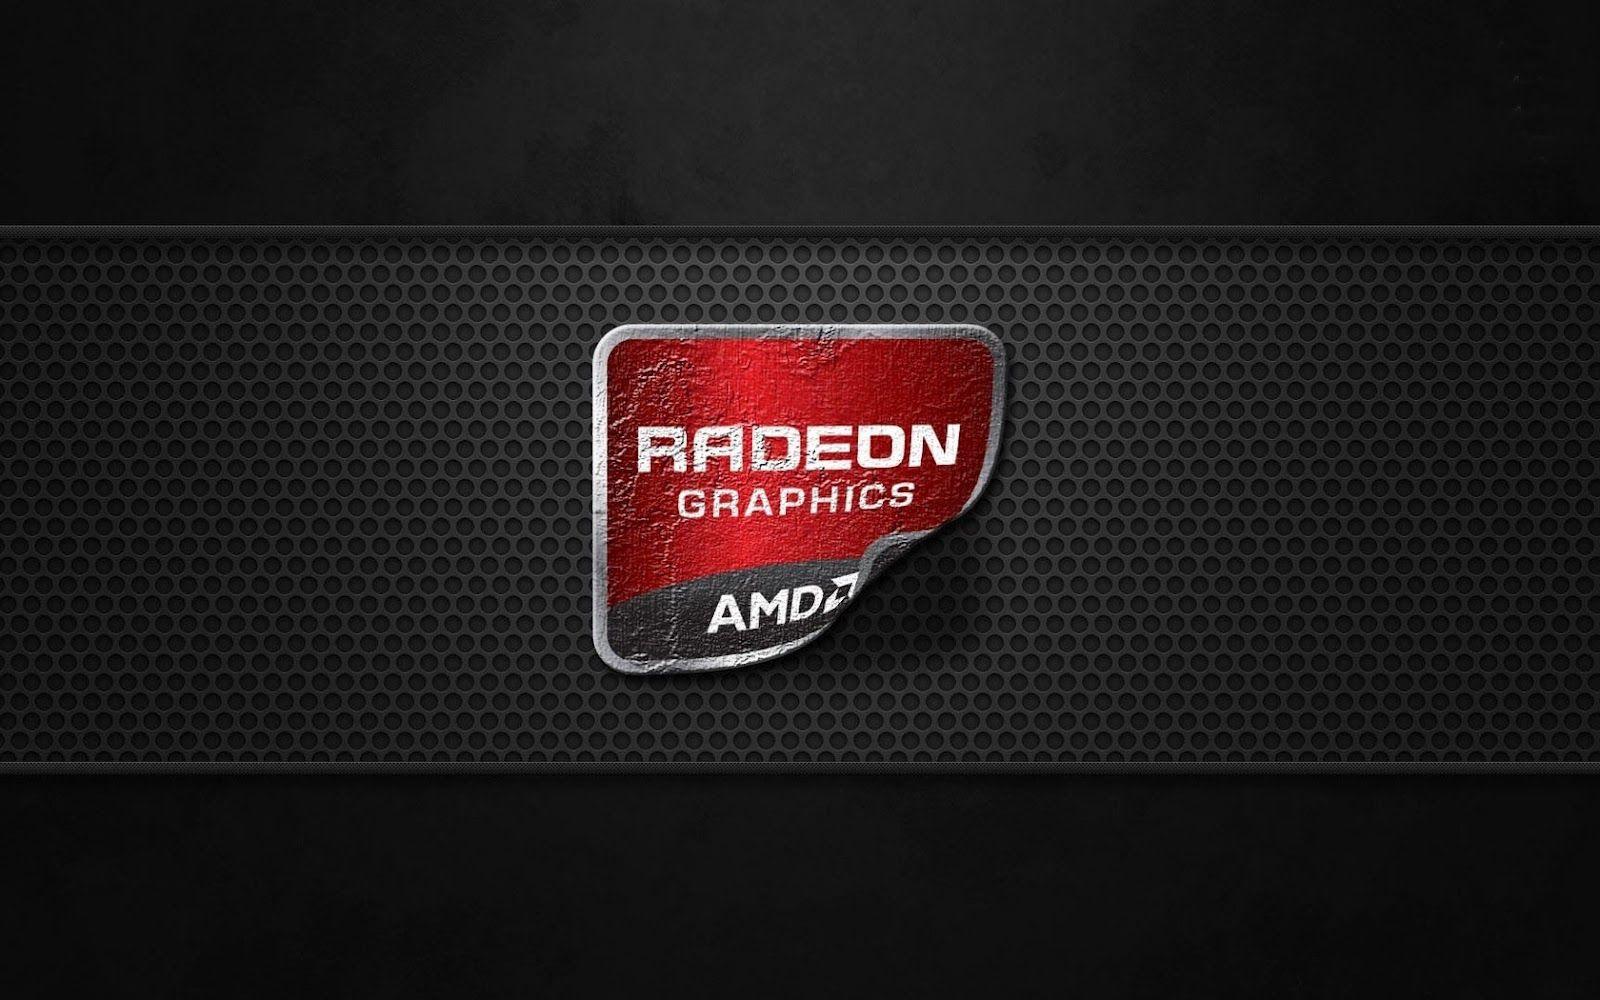 AMD Radeon Graphics